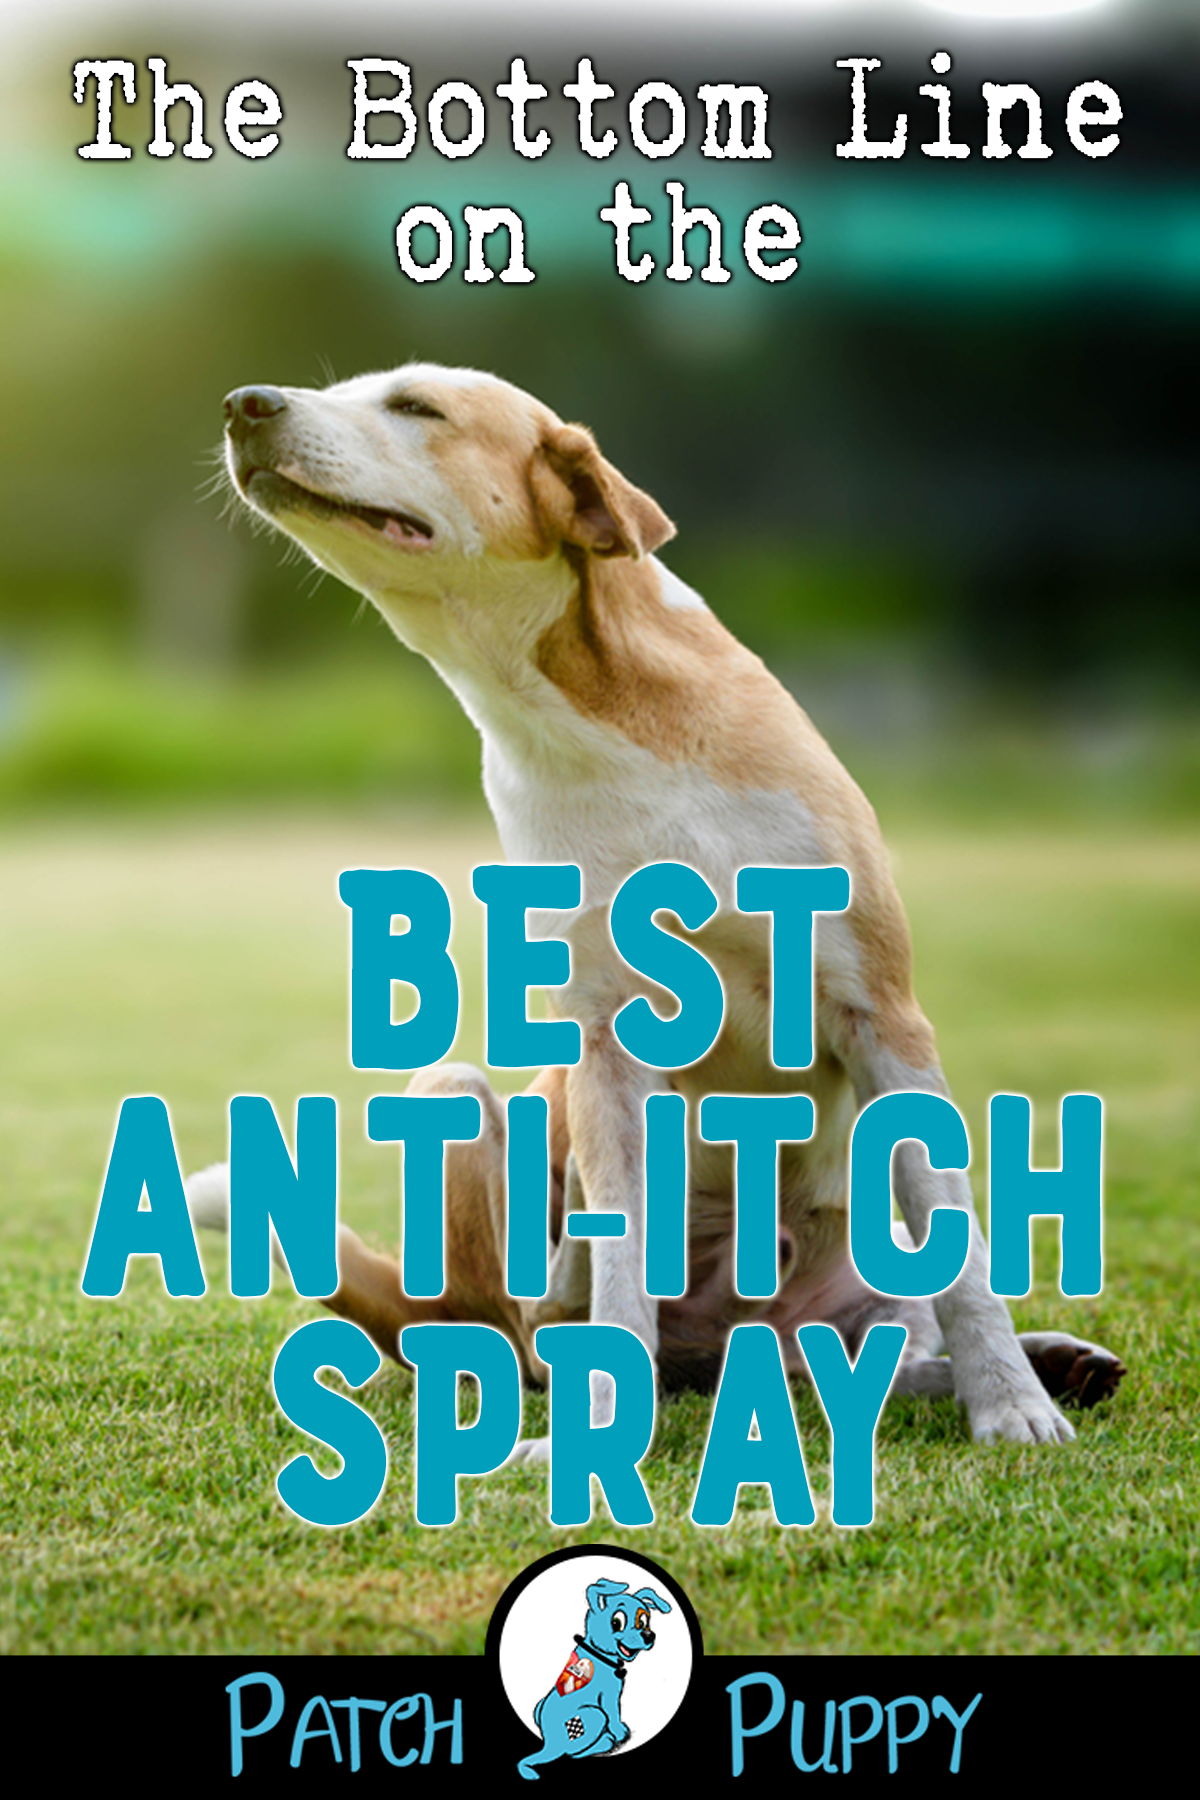 0d0b61f9a53f3bd37ff86eb3f059faff - How Can I Get My Dog To Stop Scratching Himself